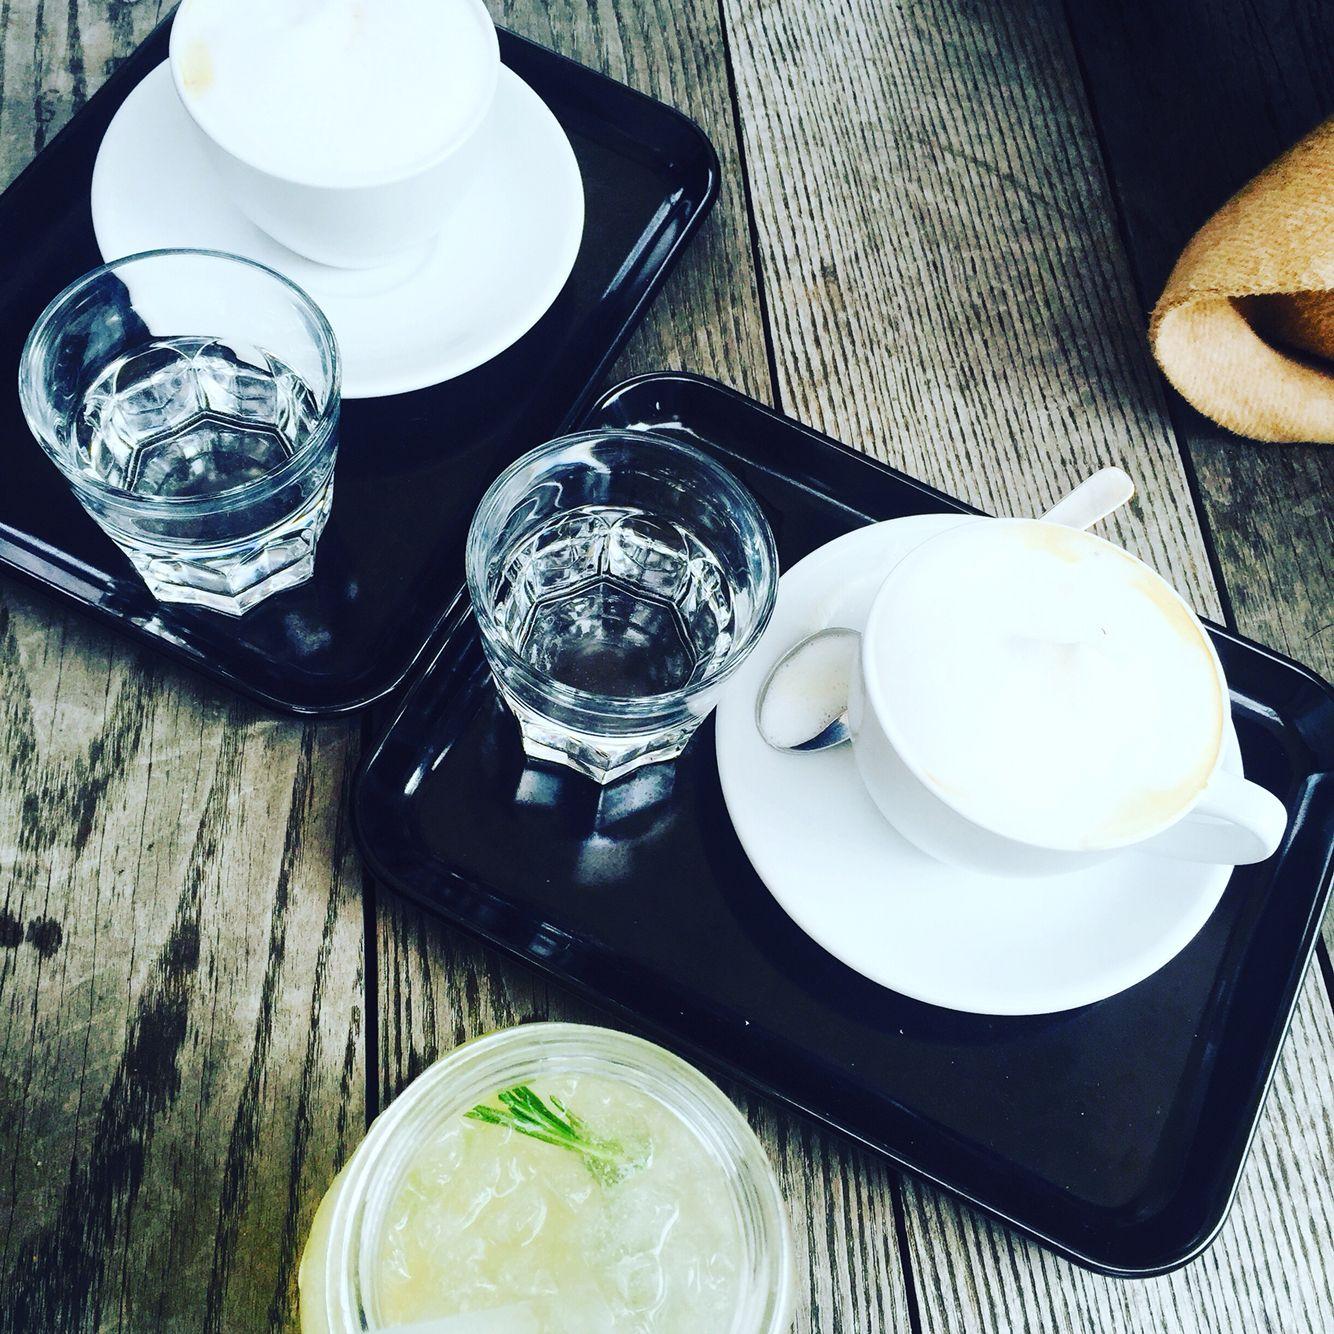 #stuttgart #kaffee #limettensaft